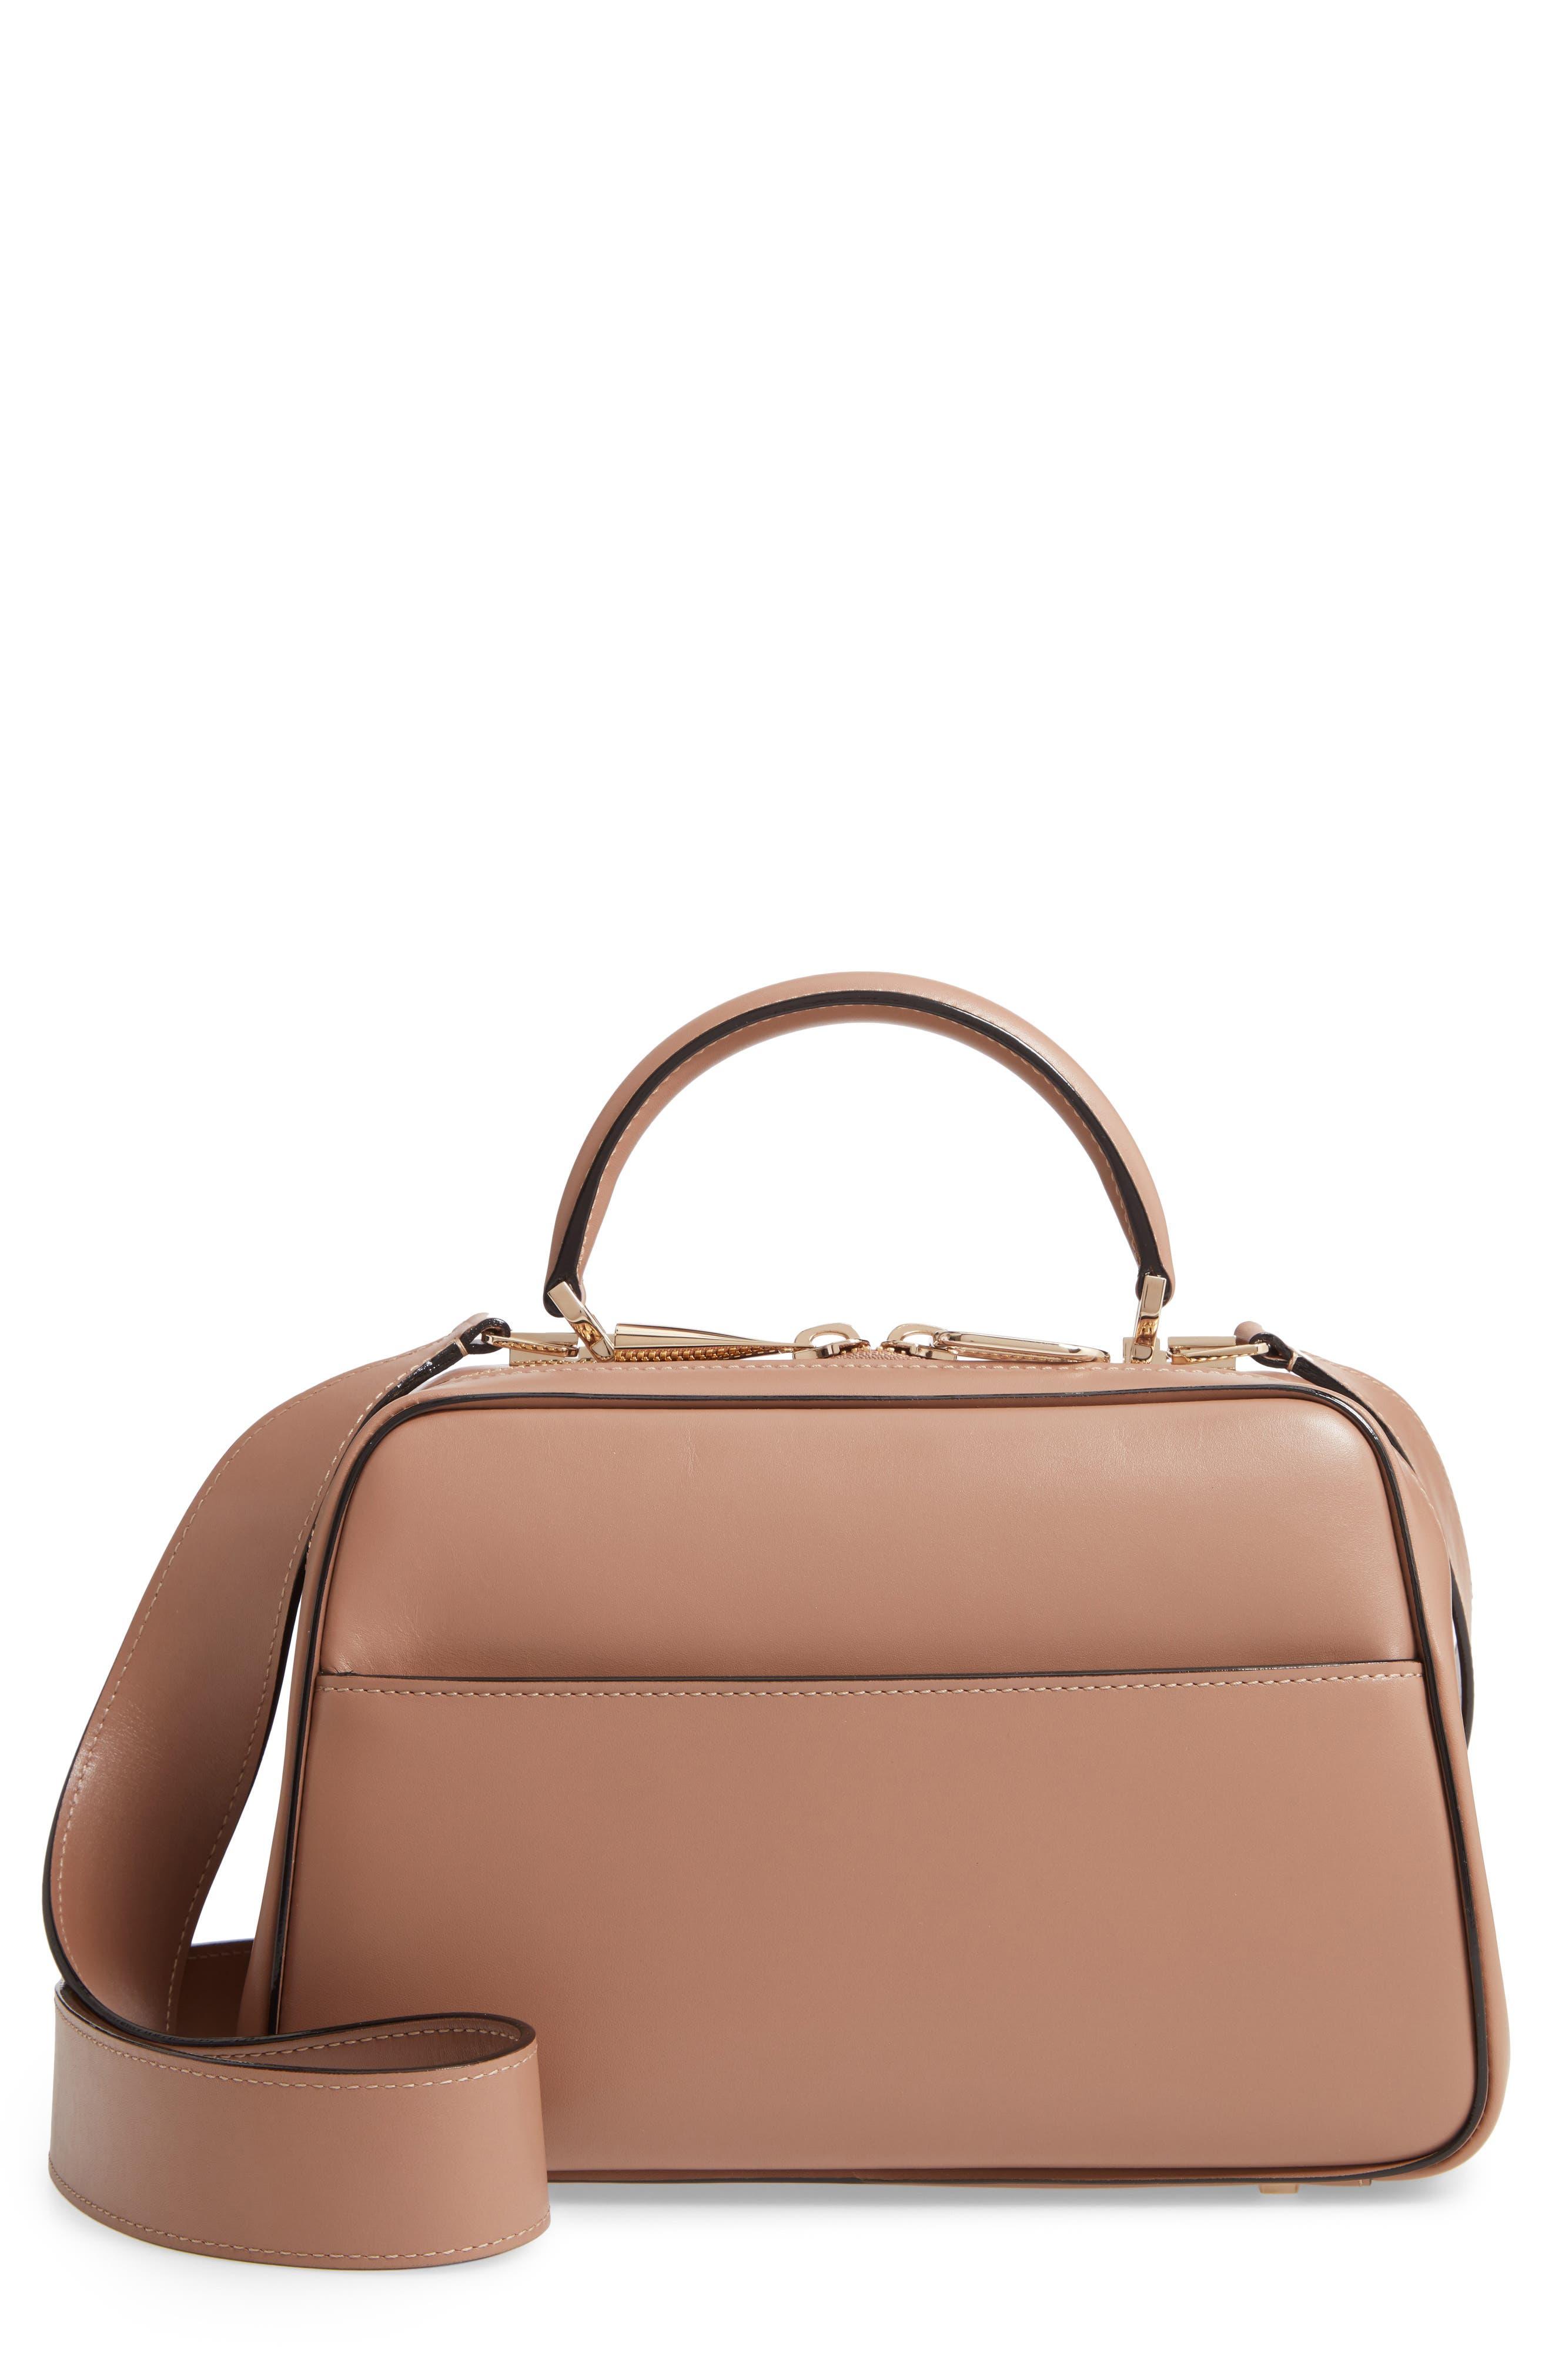 Valextra Medium Serie Leather Top Handle Bag   Nordstrom